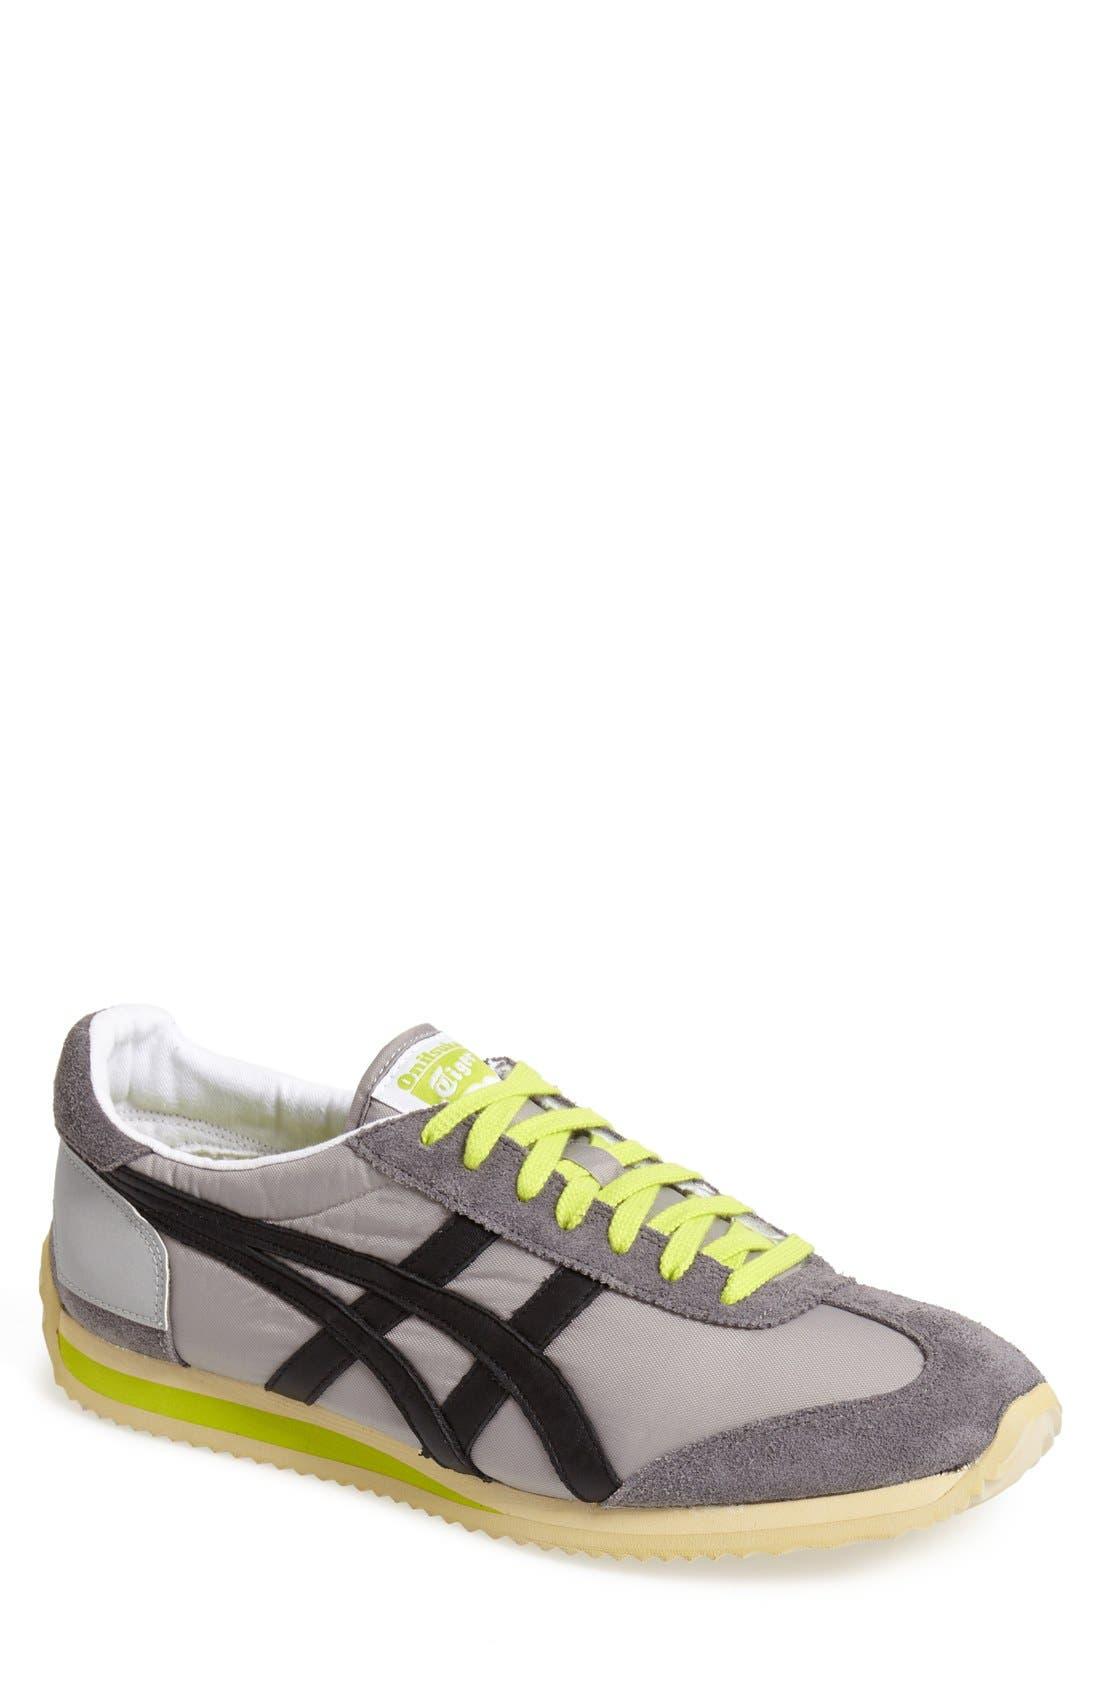 Main Image - Onitsuka Tiger™ 'California '78™ Vintage' Athletic Shoe